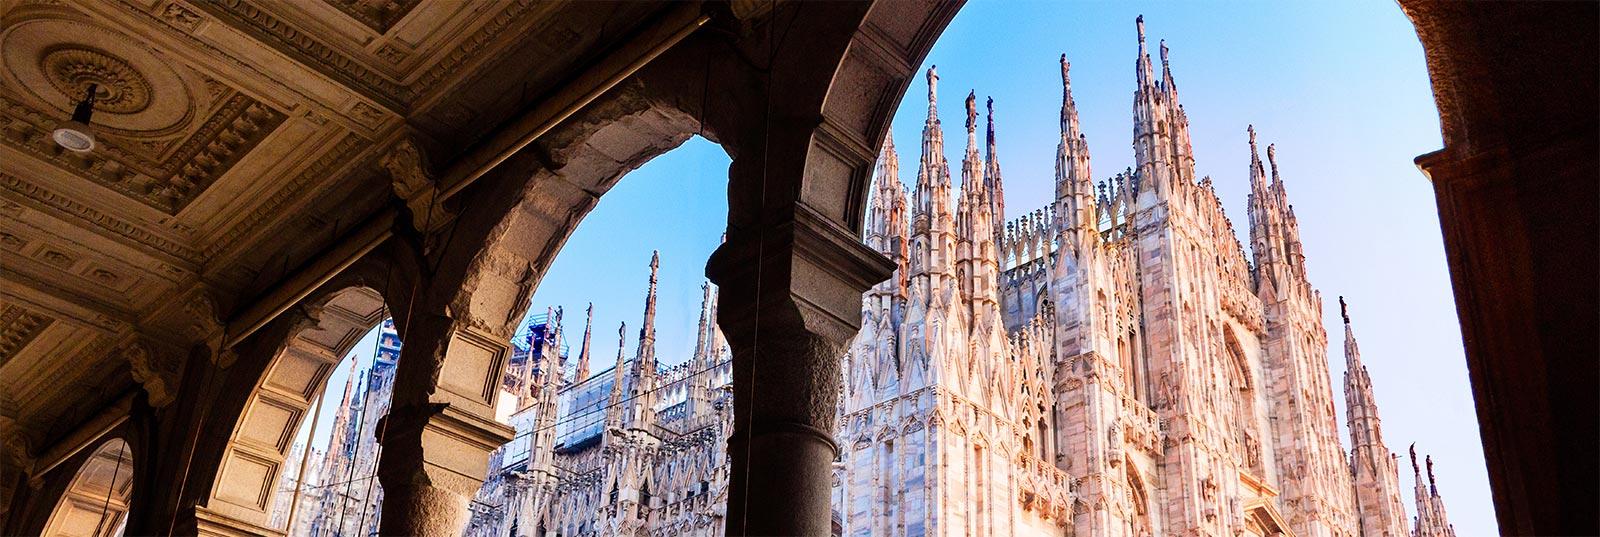 Guía turística de Milão